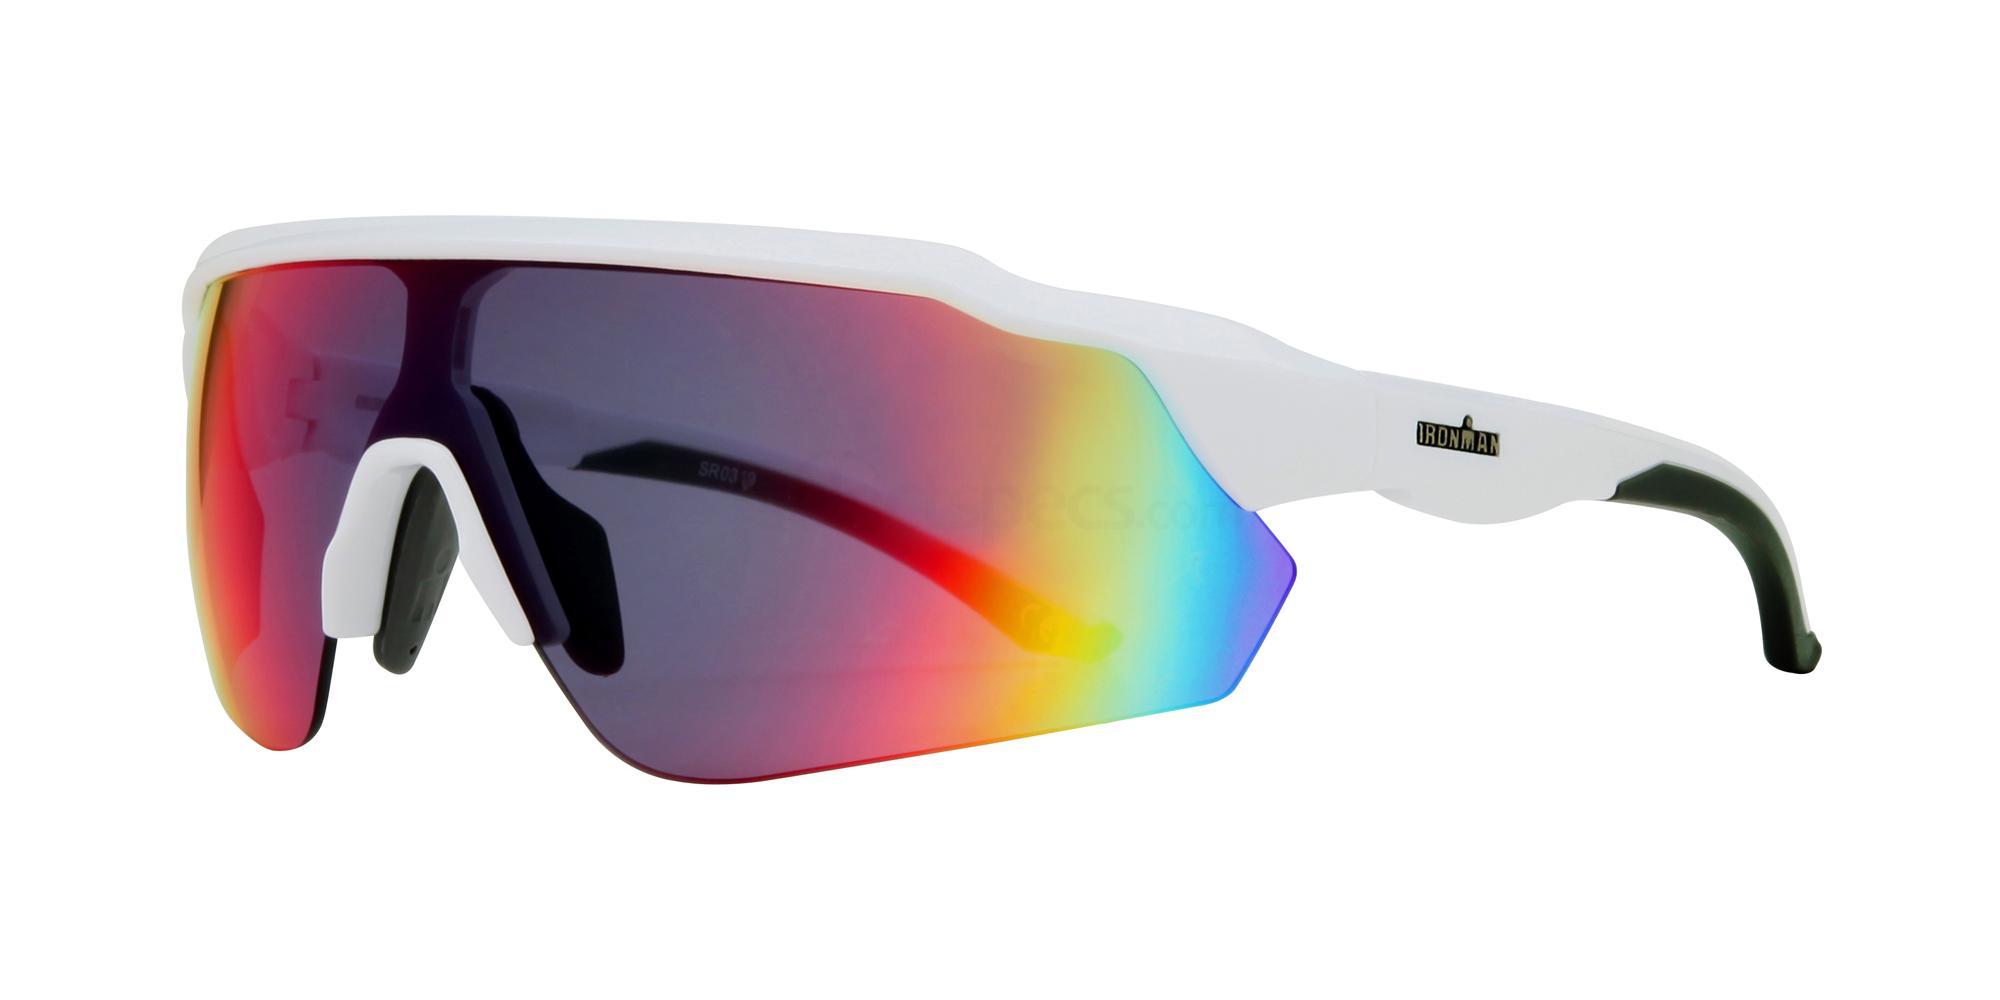 SIMT19354 SIMT19354 Sunglasses, Ironman